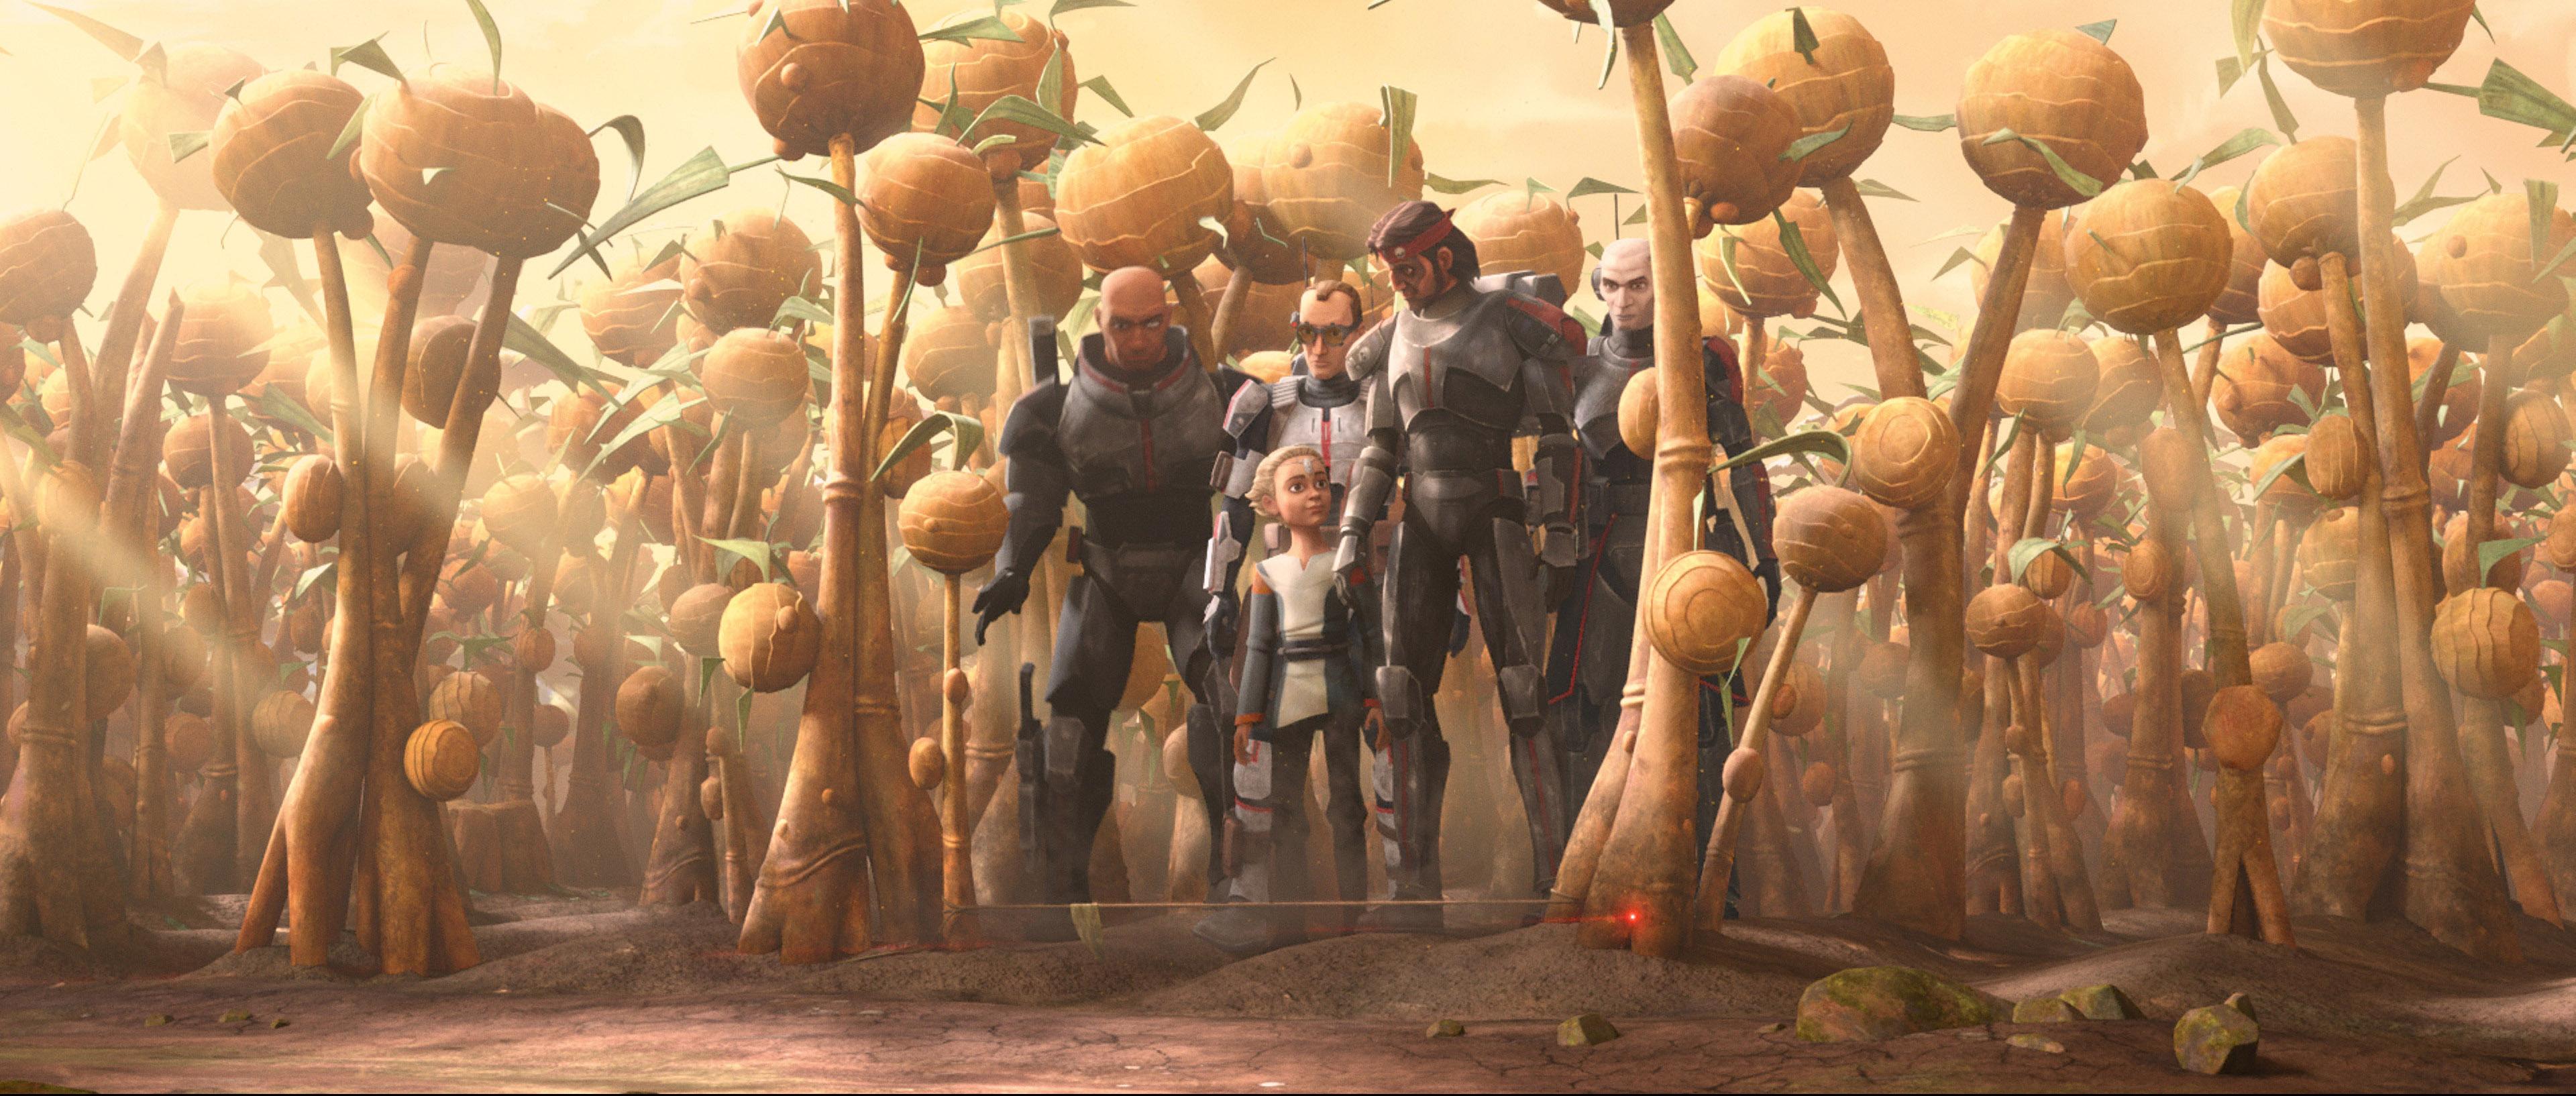 Star Wars: The Bad Batch - Episódio 2 - Crítica do Chippu